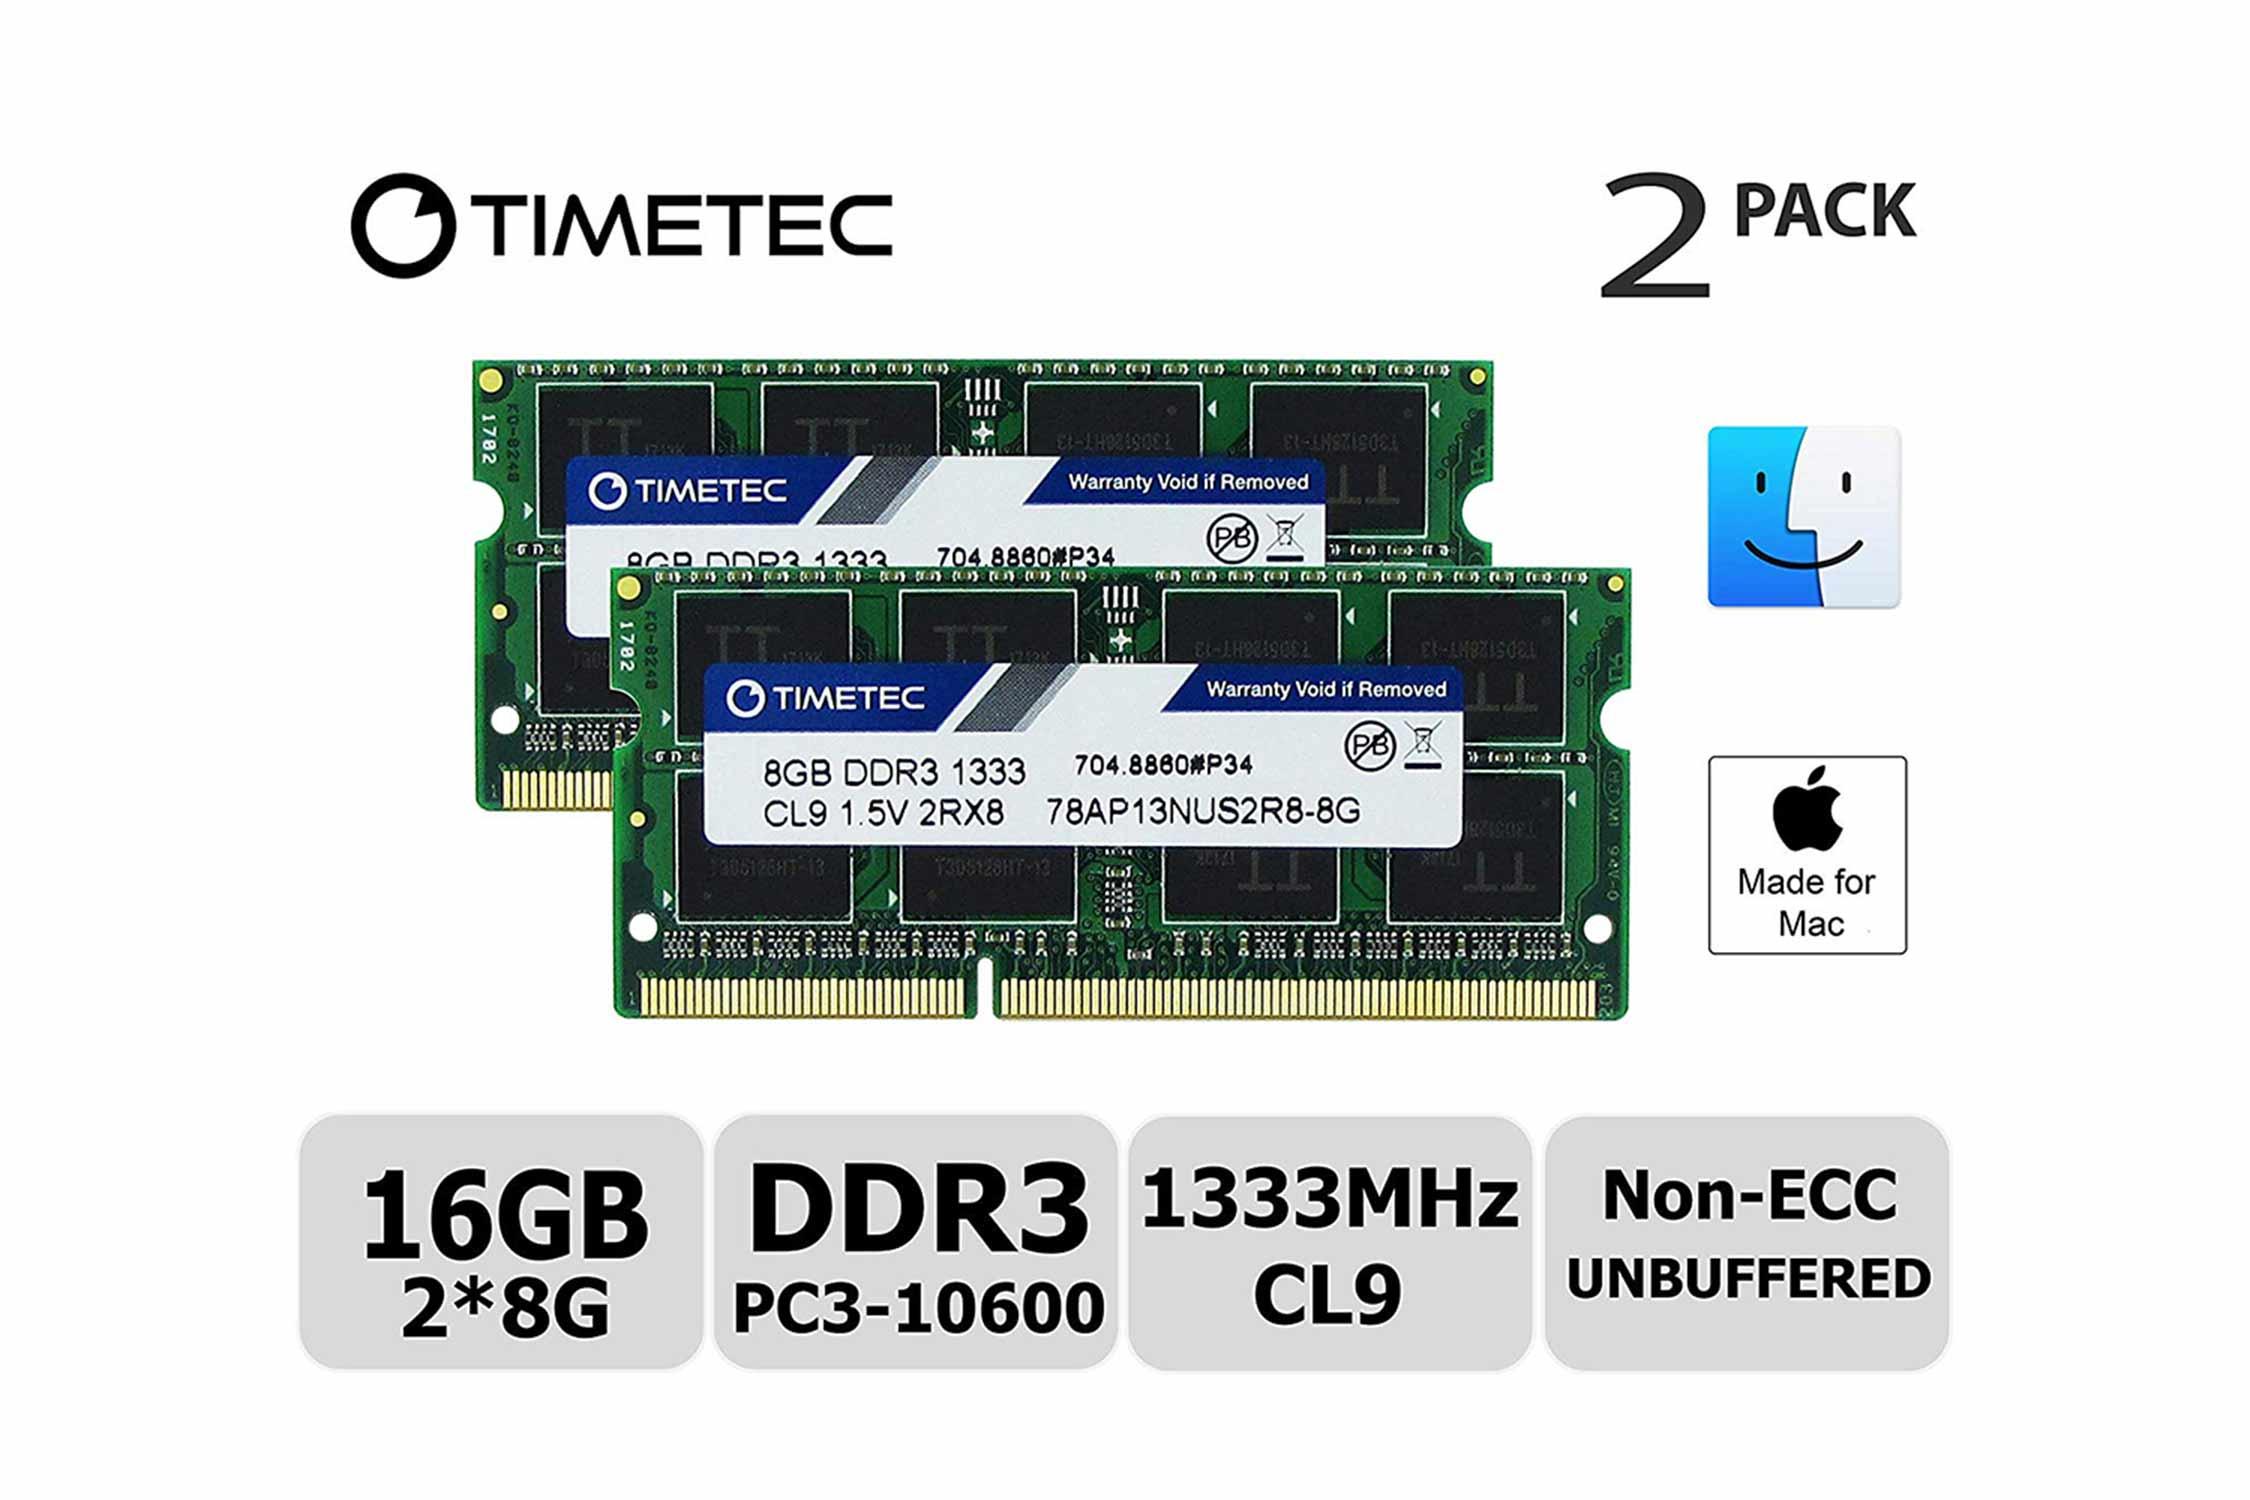 iMac Proのメモリ 商品 イメージ